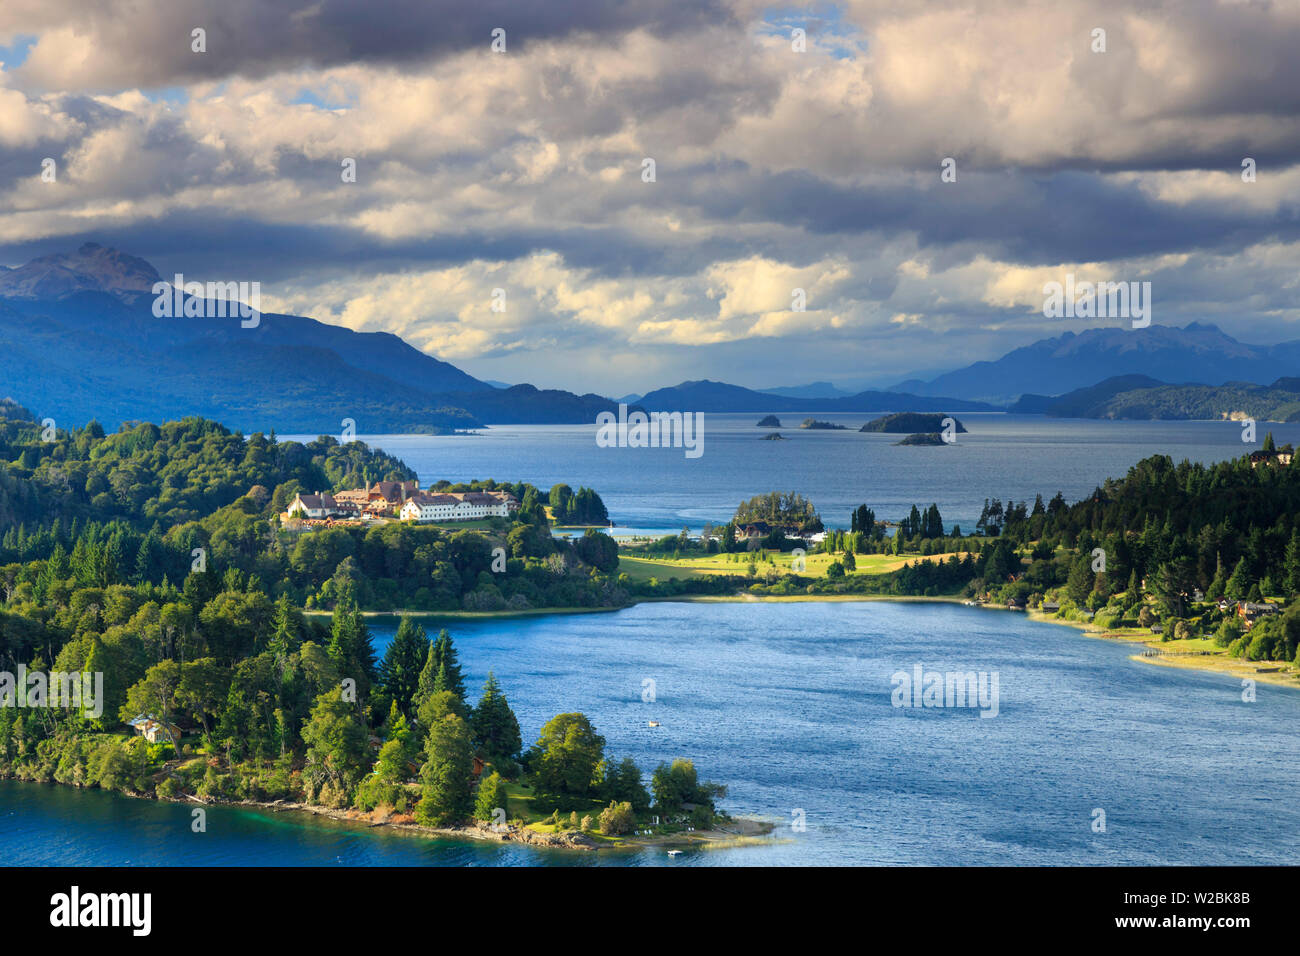 Argentina, Patagonia, Bariloche, Nahuel Huapi National Park, Llao Lllao historic Hotel - Stock Image